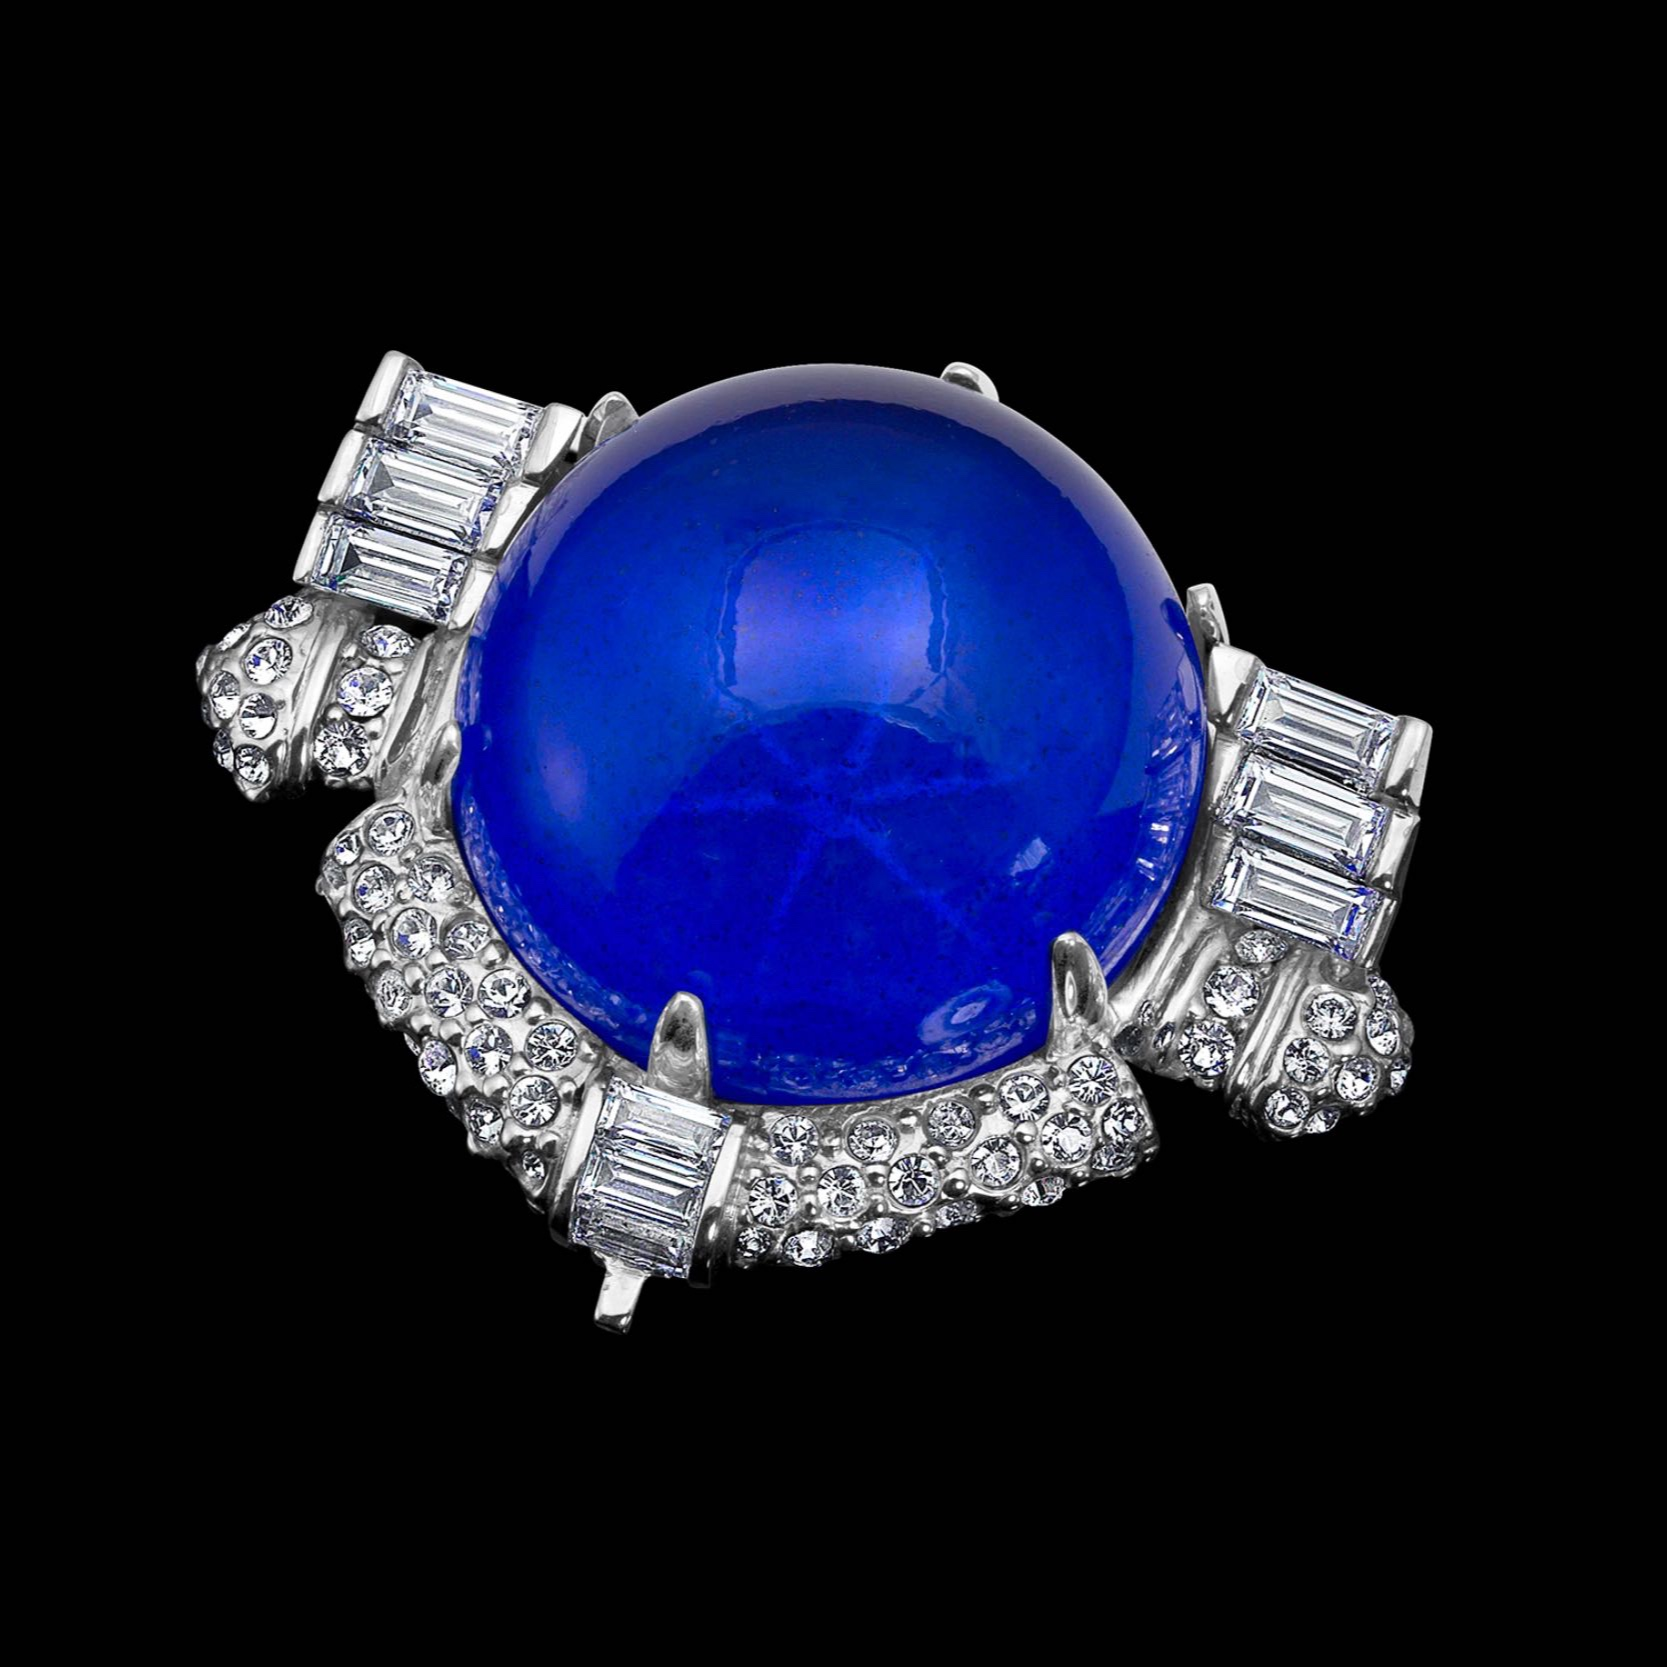 "Carole Lombard's Star Sapphire Brooch worn in ""My Man Godfrey"""